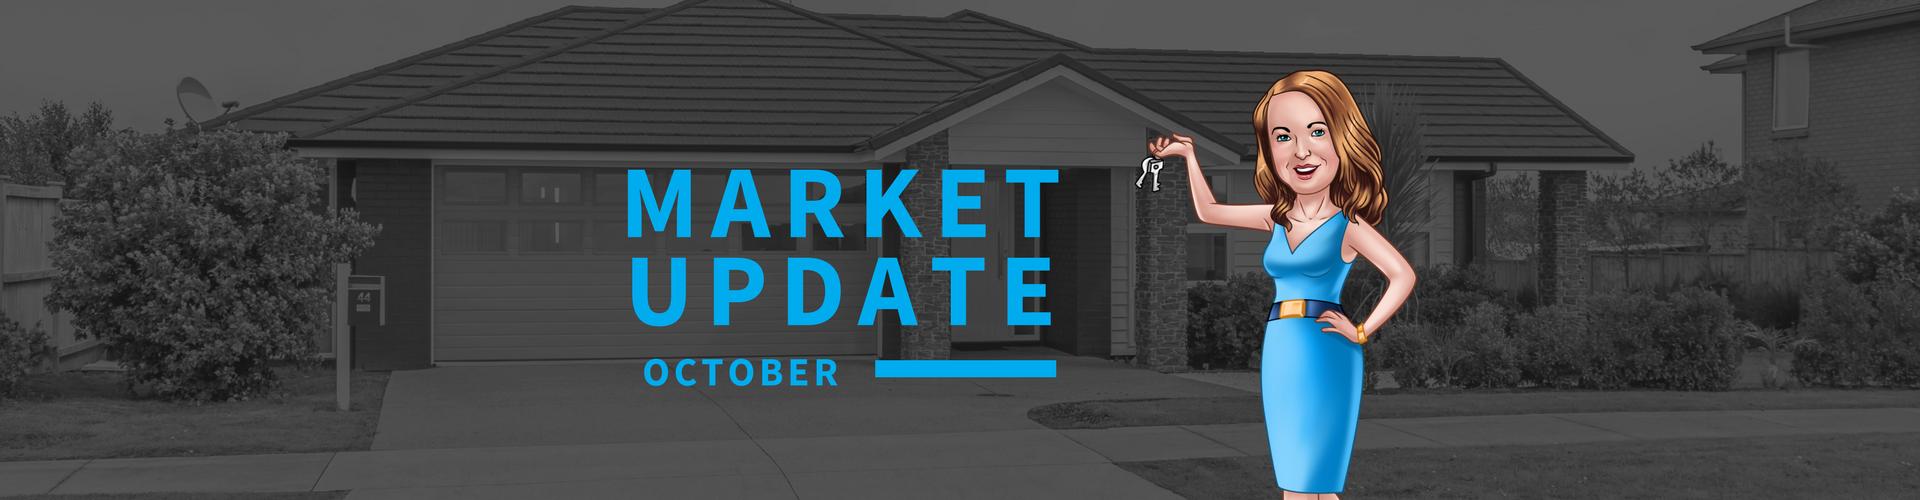 market update (1).png